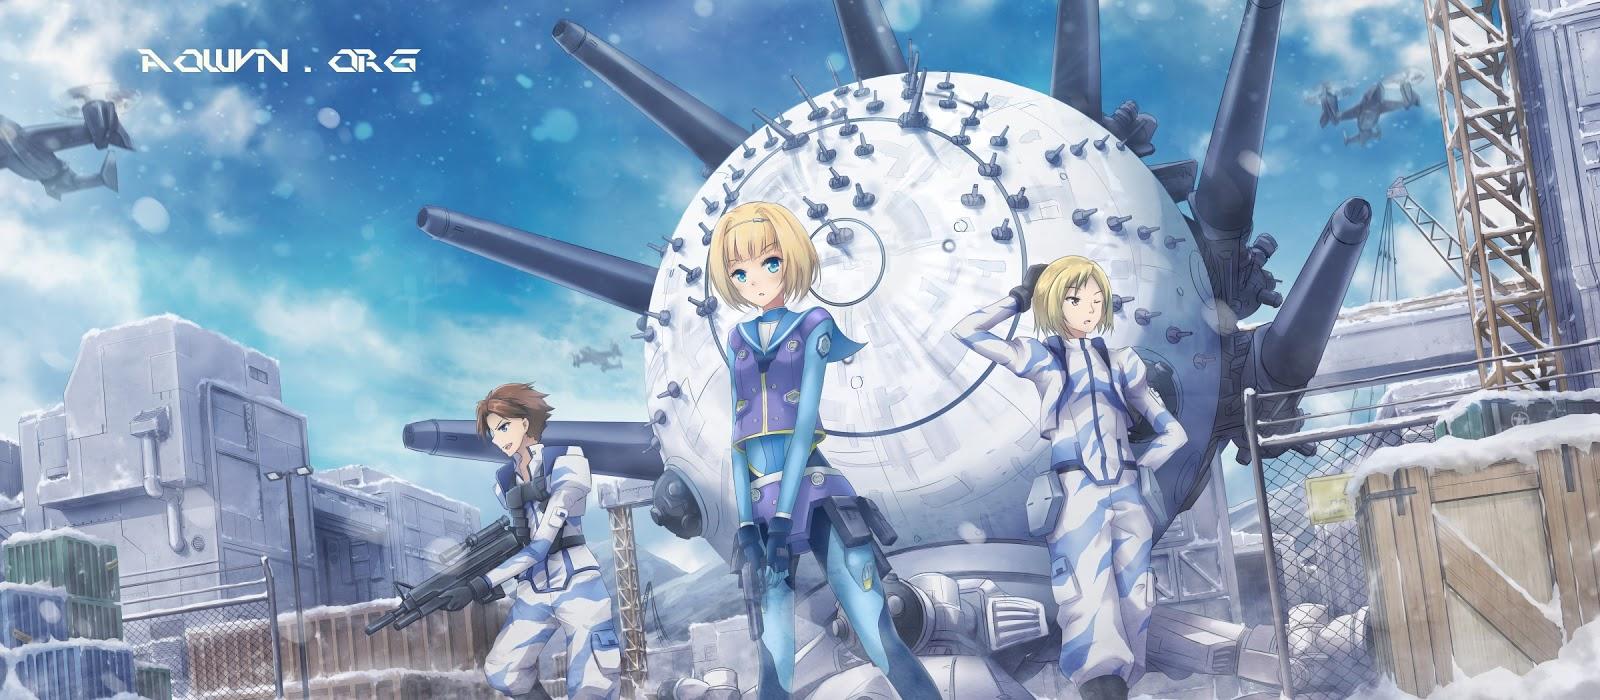 AowVN%2B%25284%2529 - [ Anime 3gp Mp4 ] Heavy Object | Vietsub - Mecha Art Đẹp